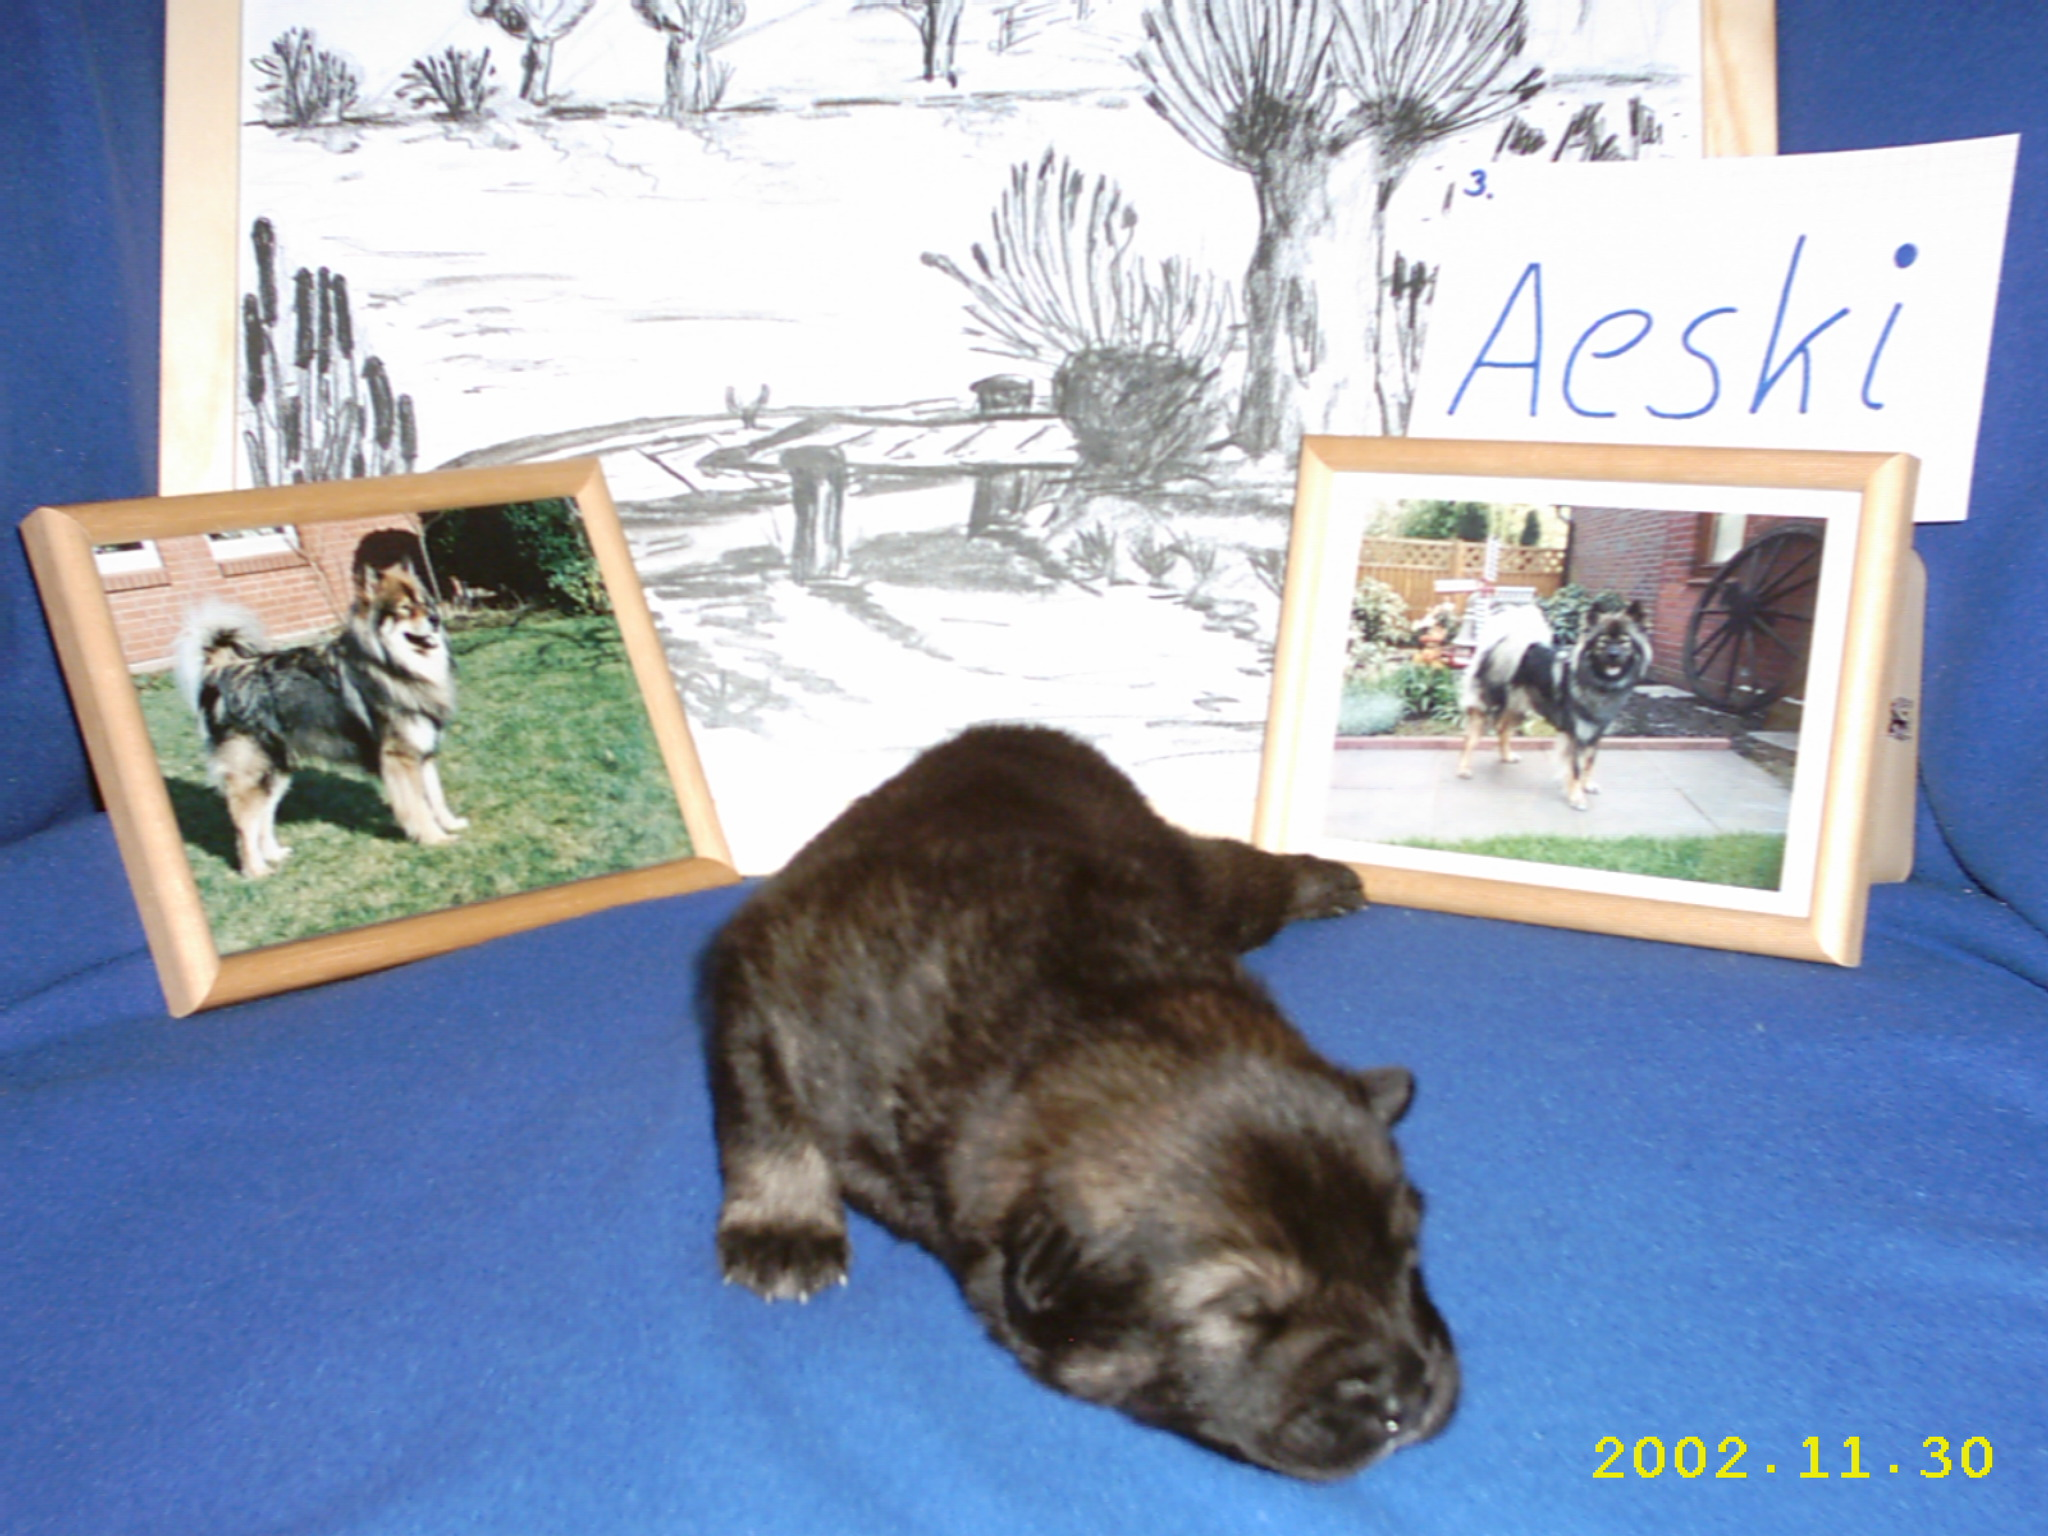 Aeski